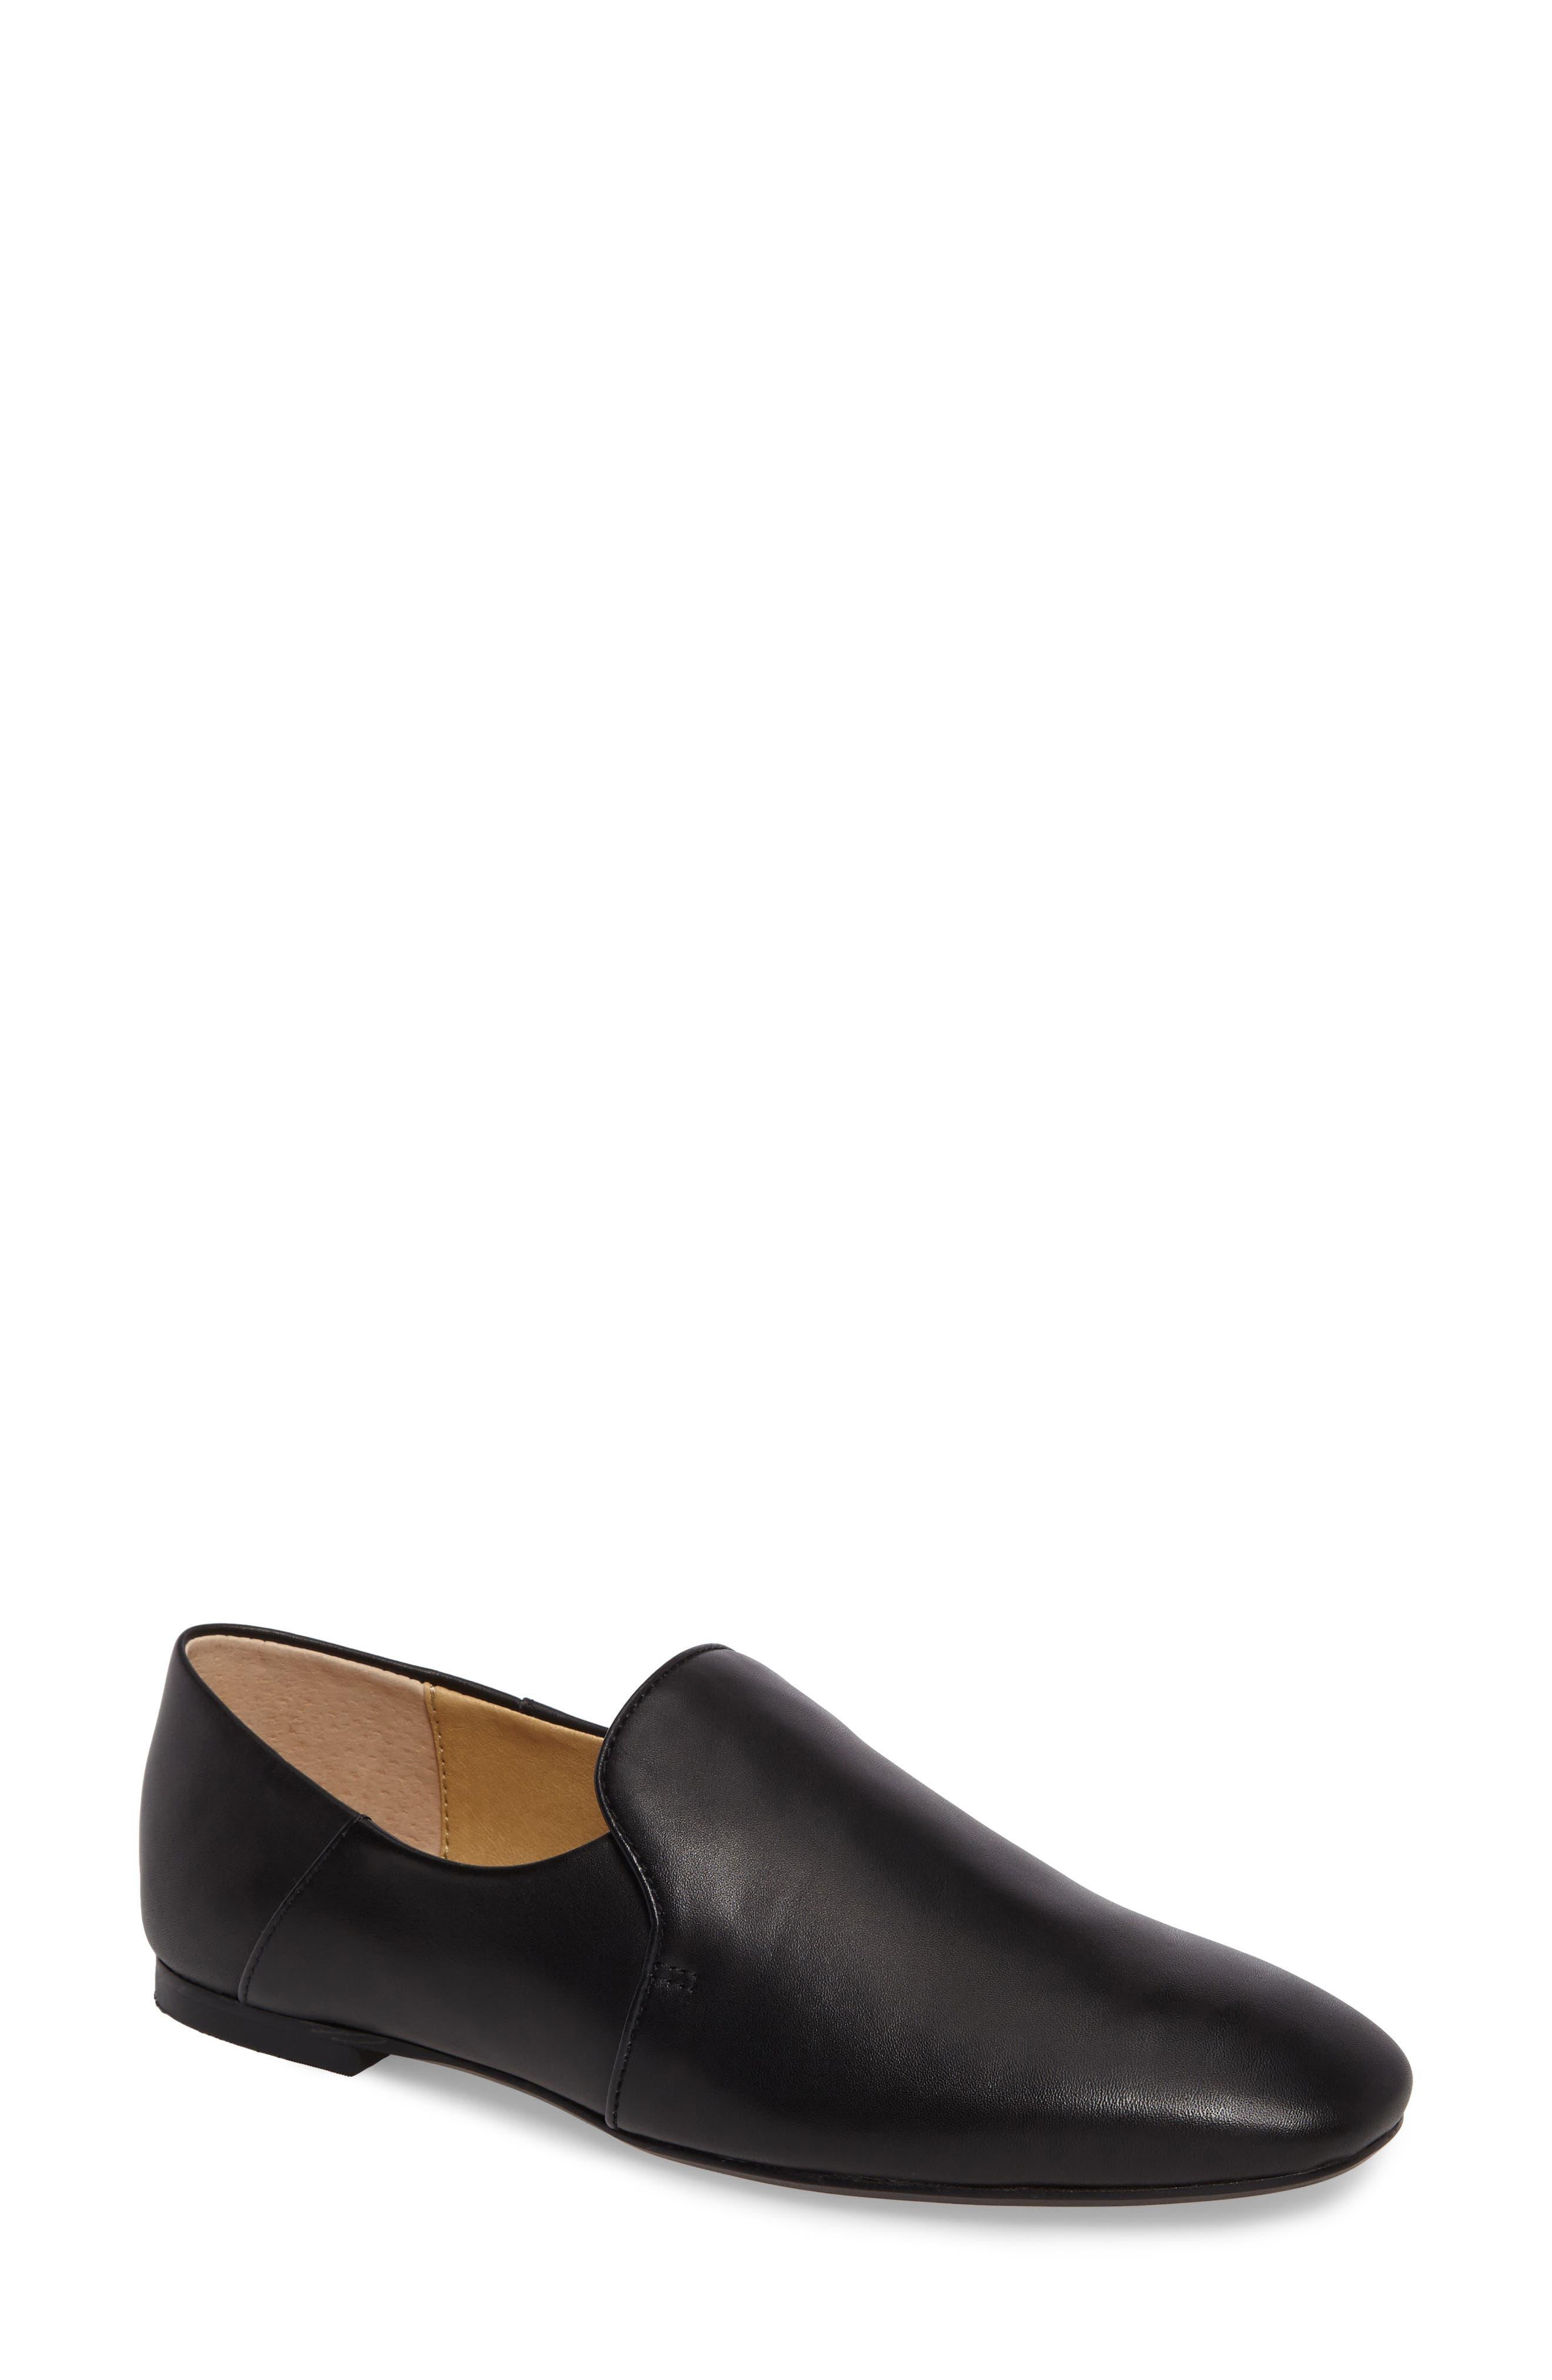 SPLENDID Derby Loafer Flat